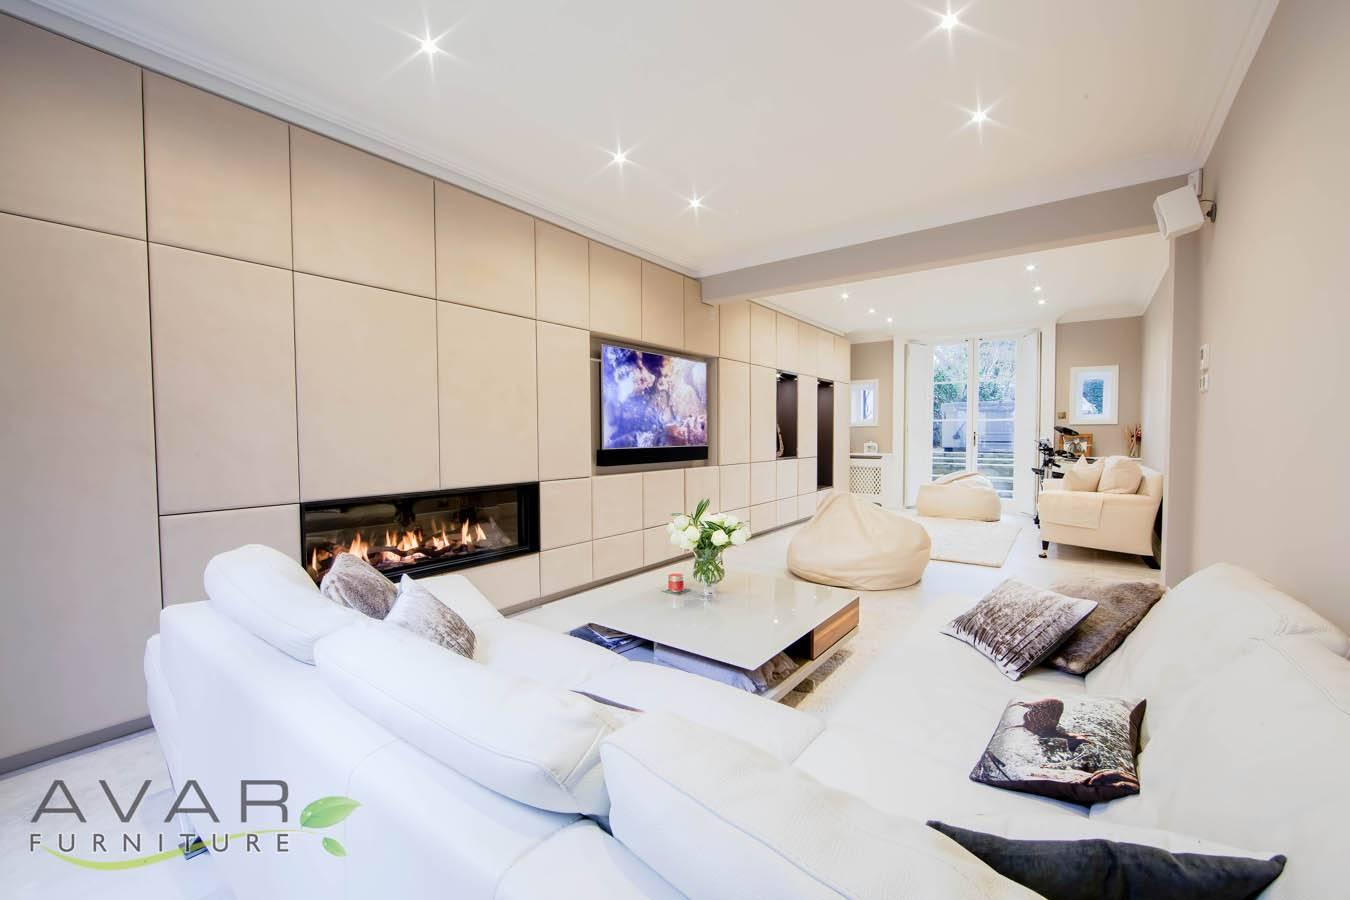 Ƹӝʒ Bespoke Tv/entertainment Units   North London, Uk   Avar Furniture In Bespoke Tv Cabinets (View 8 of 15)